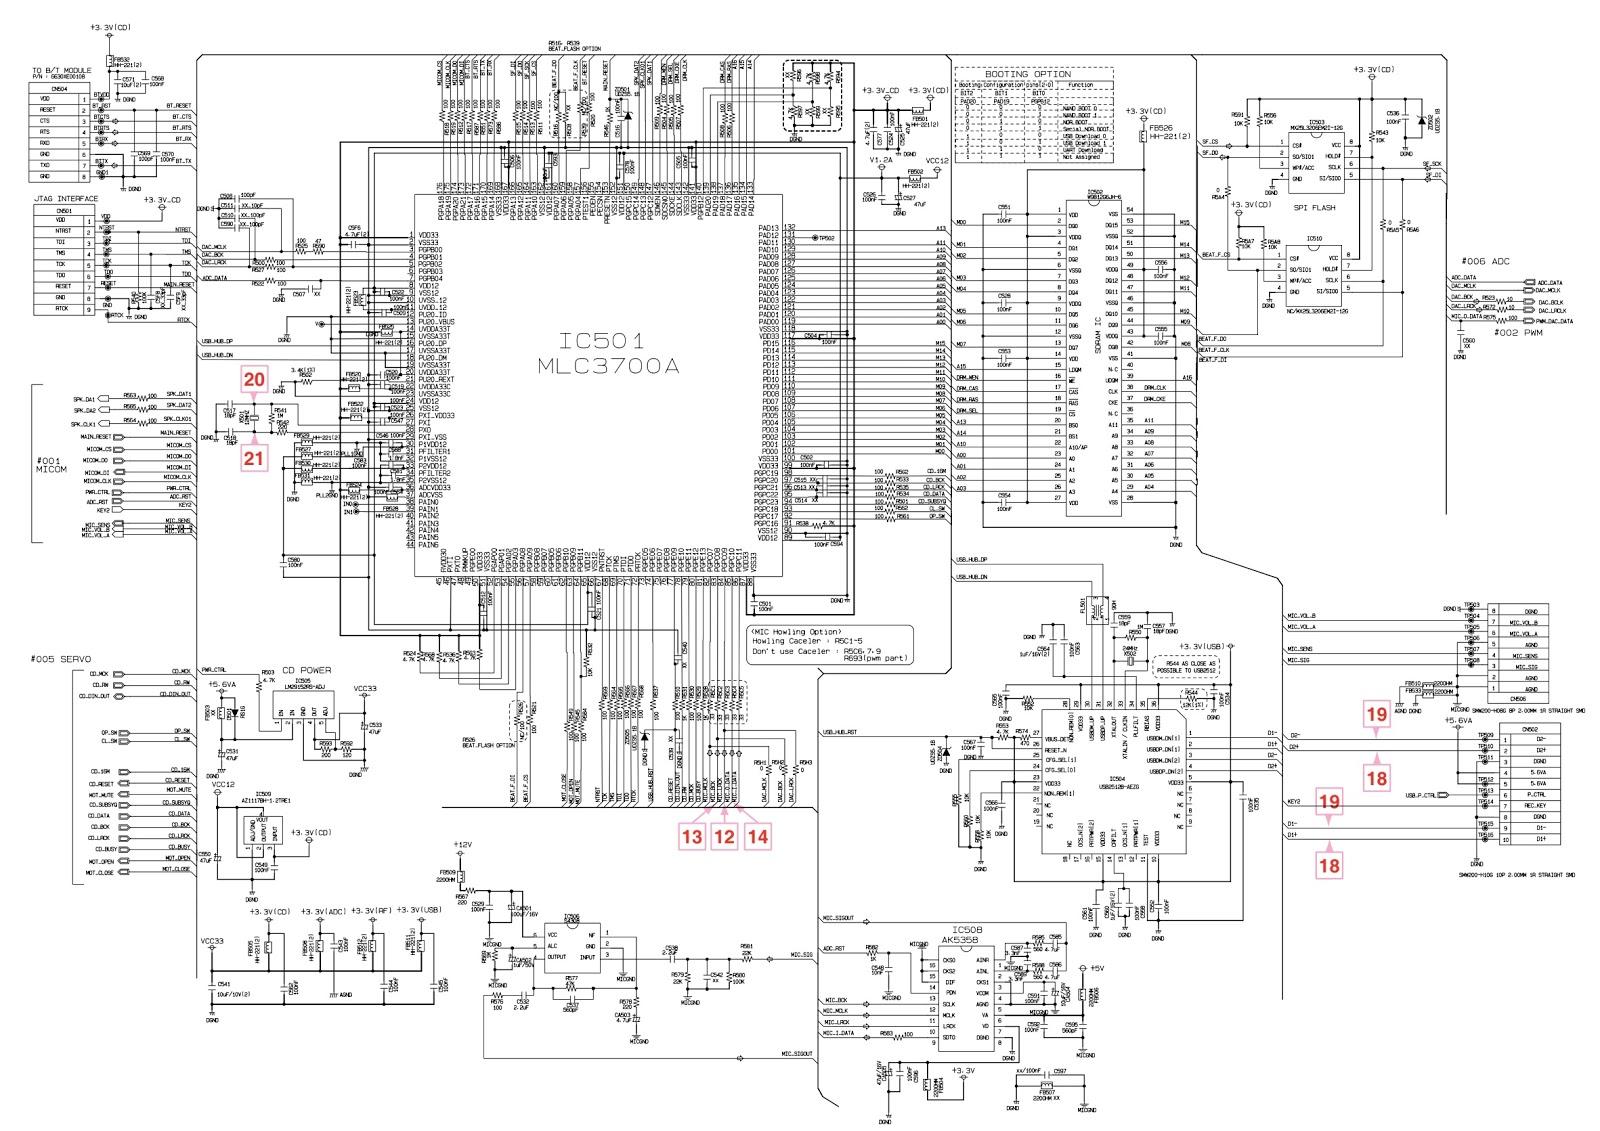 Lg Cm Smps And Main Amplifier Circuit Diagram